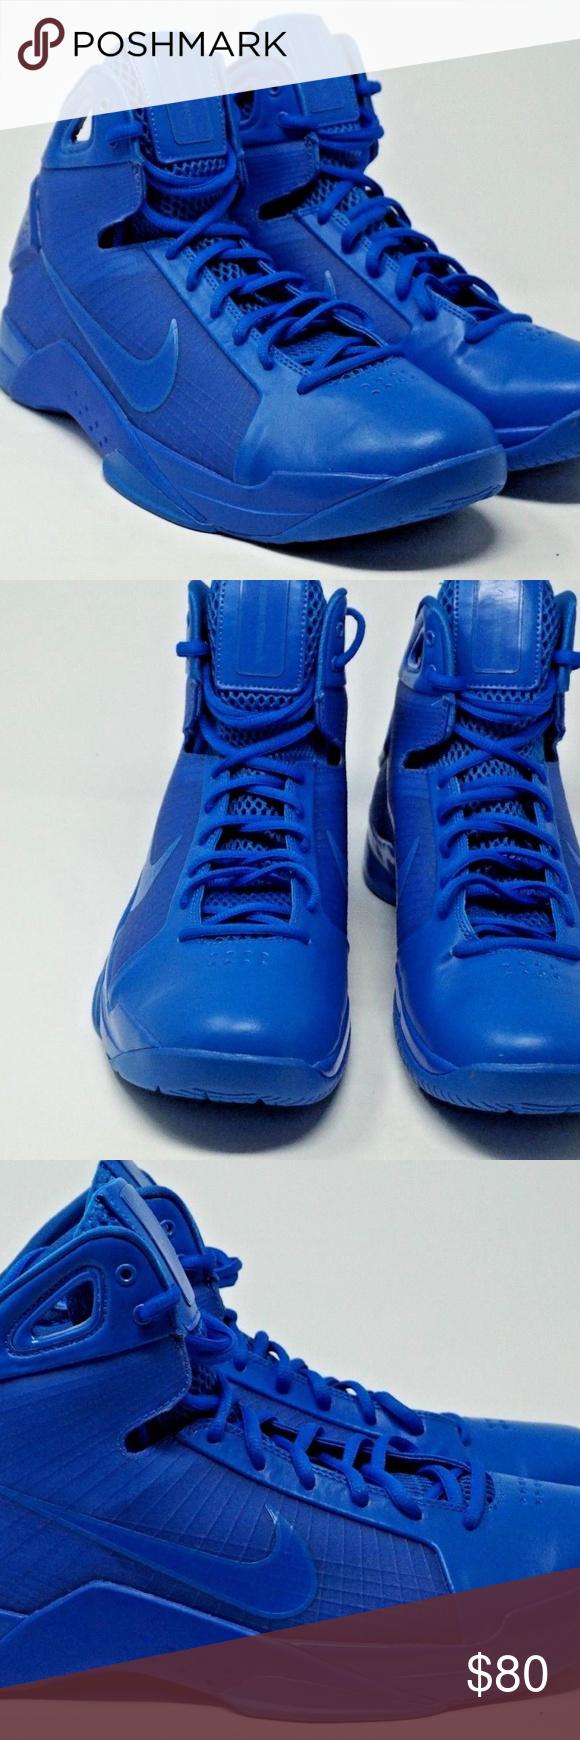 526c9602802c 2016 Nike Hyperdunk 08 Kobe Bryant Olympics 2016 Nike Hyperdunk 08 Kobe  Bryant Olympics Photo Blue